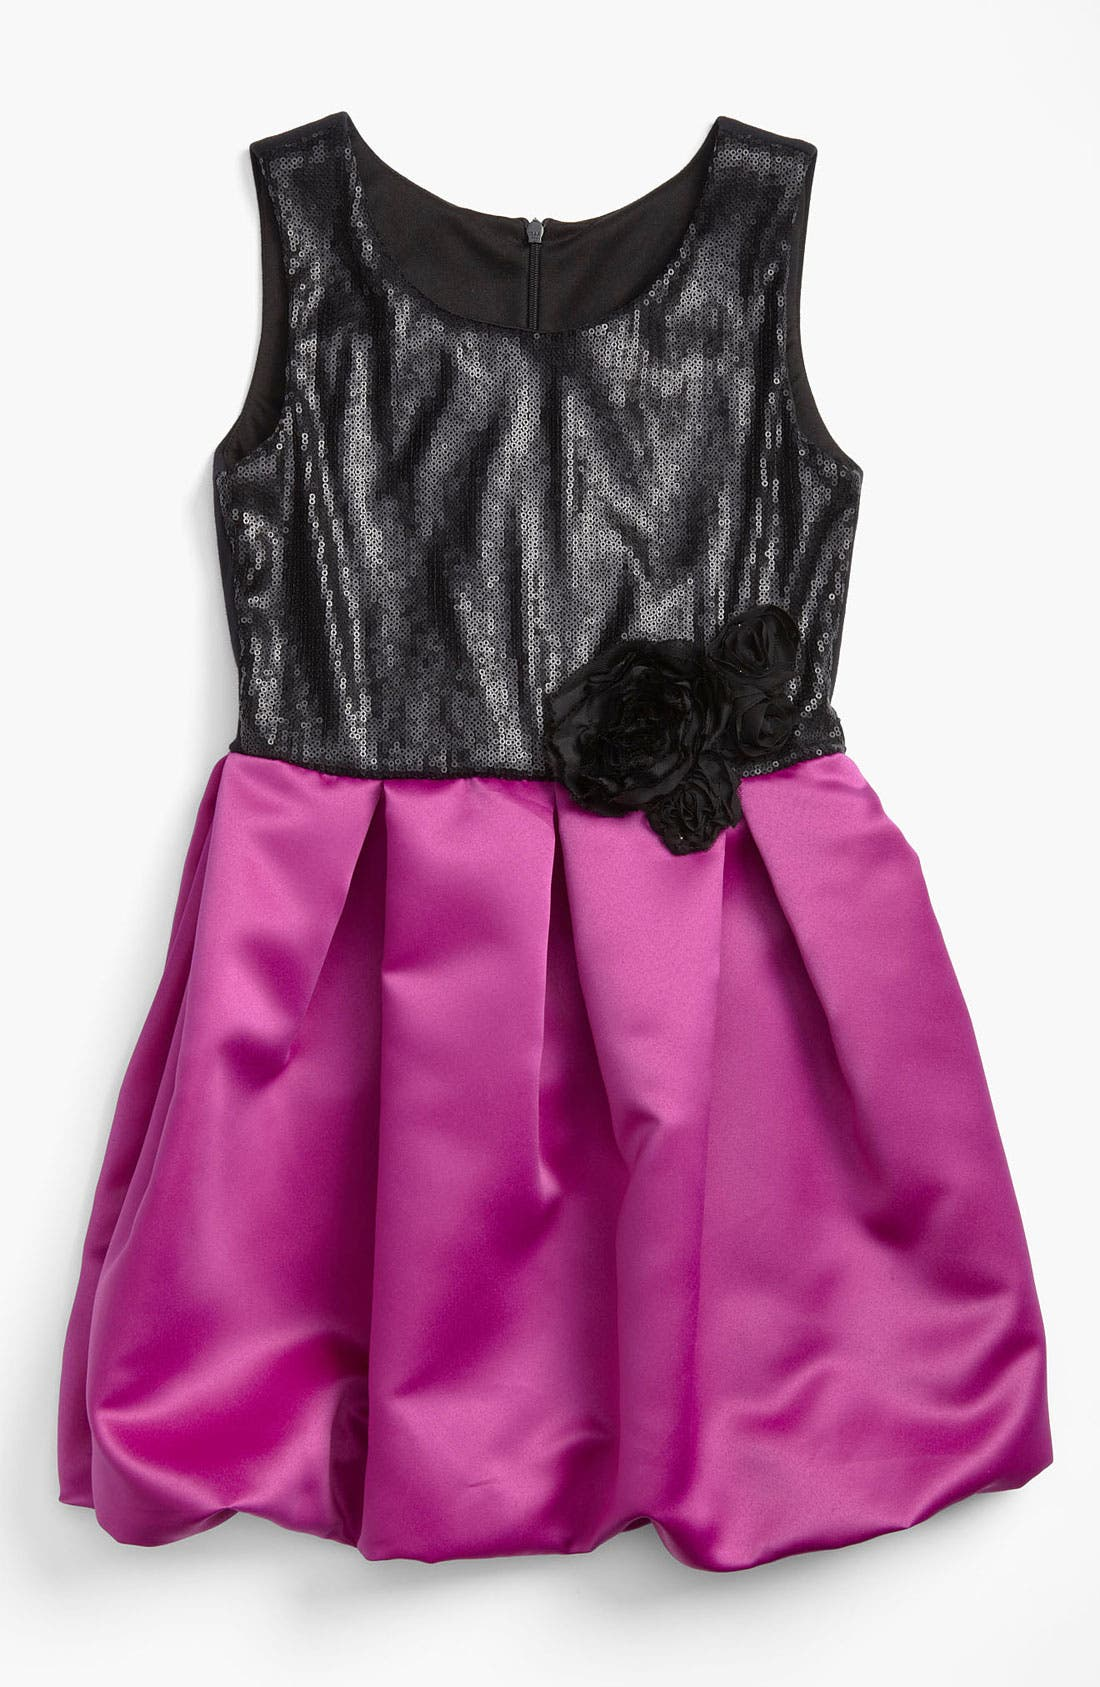 Main Image - Zoe Ltd Sequin Bubble Dress (Big Girls)